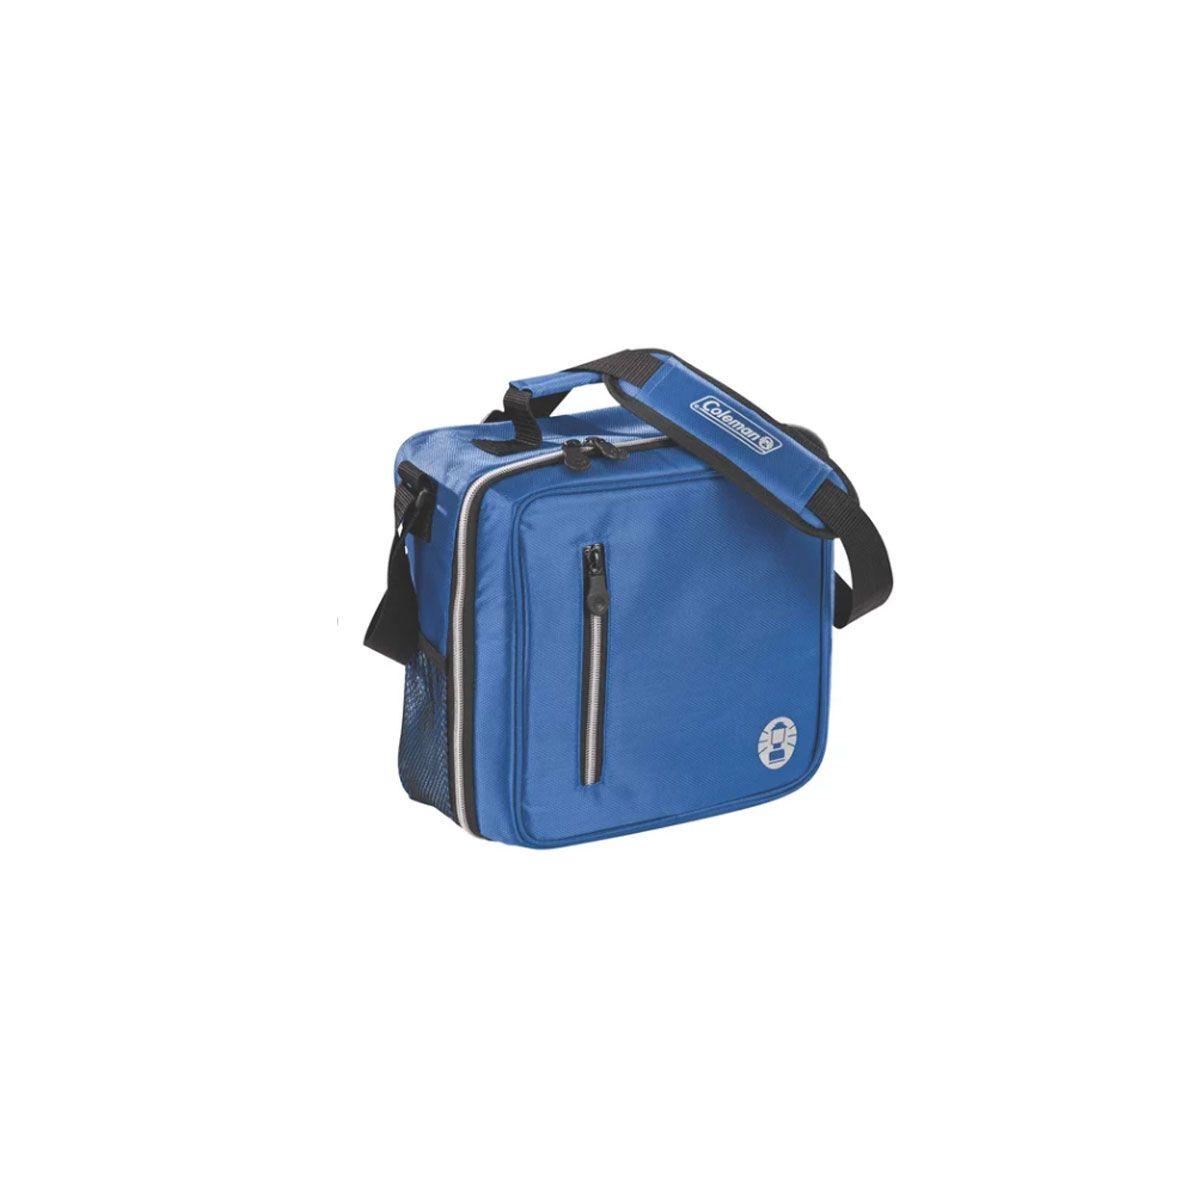 Bolsa Térmica Coleman Messenger 12 Latas Azul